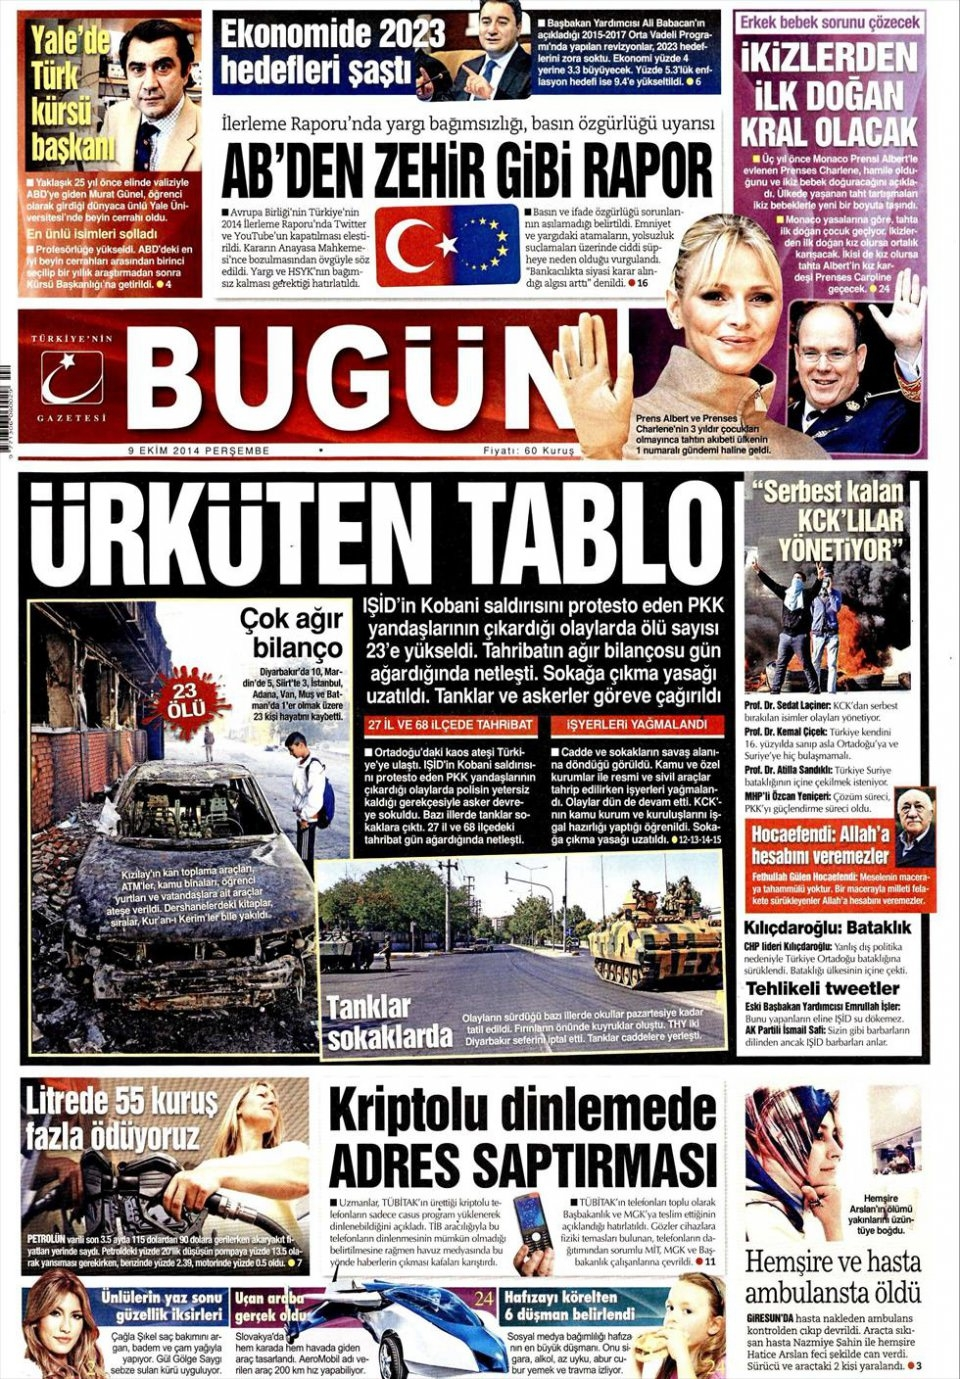 9 Ekim Gazete Manşetleri 3